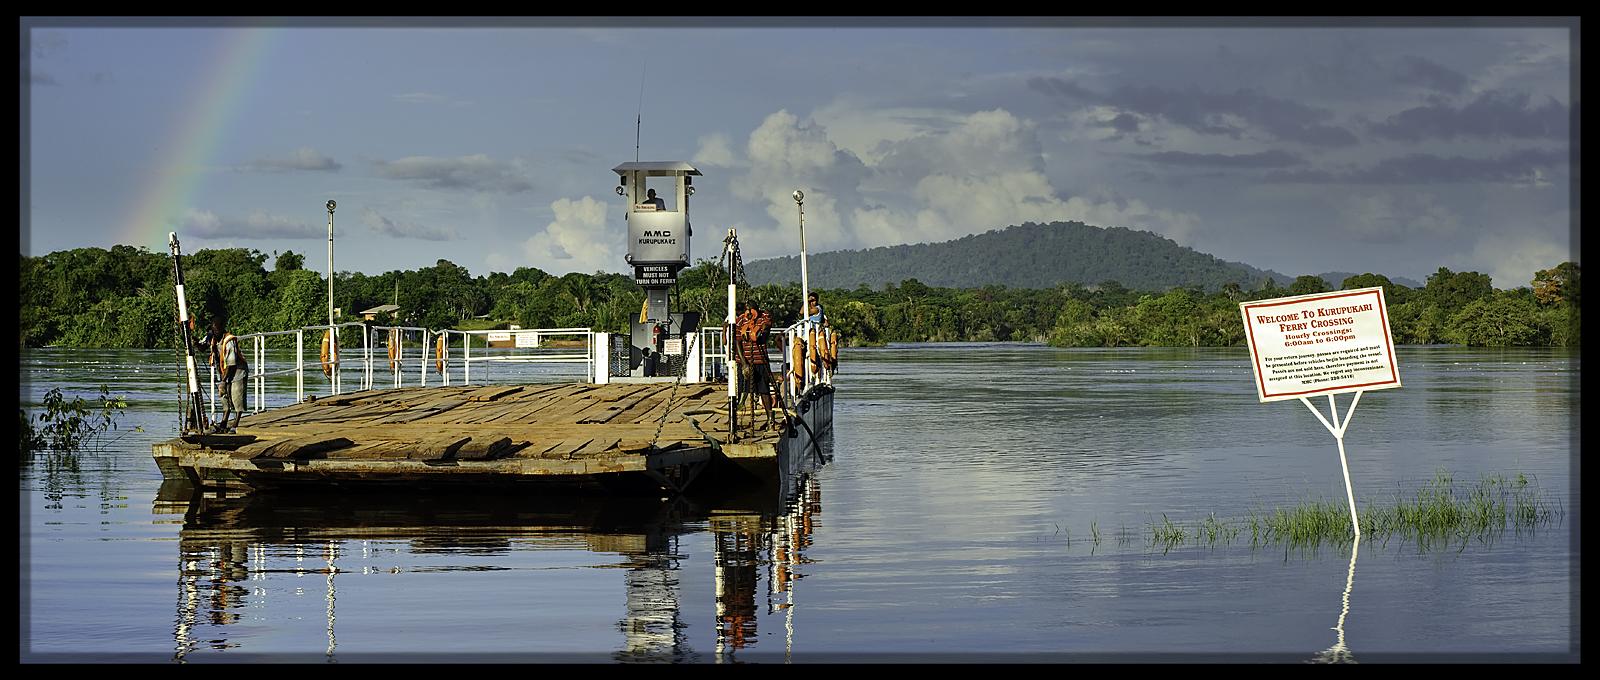 Kurupukari river ferry- only road through the interior